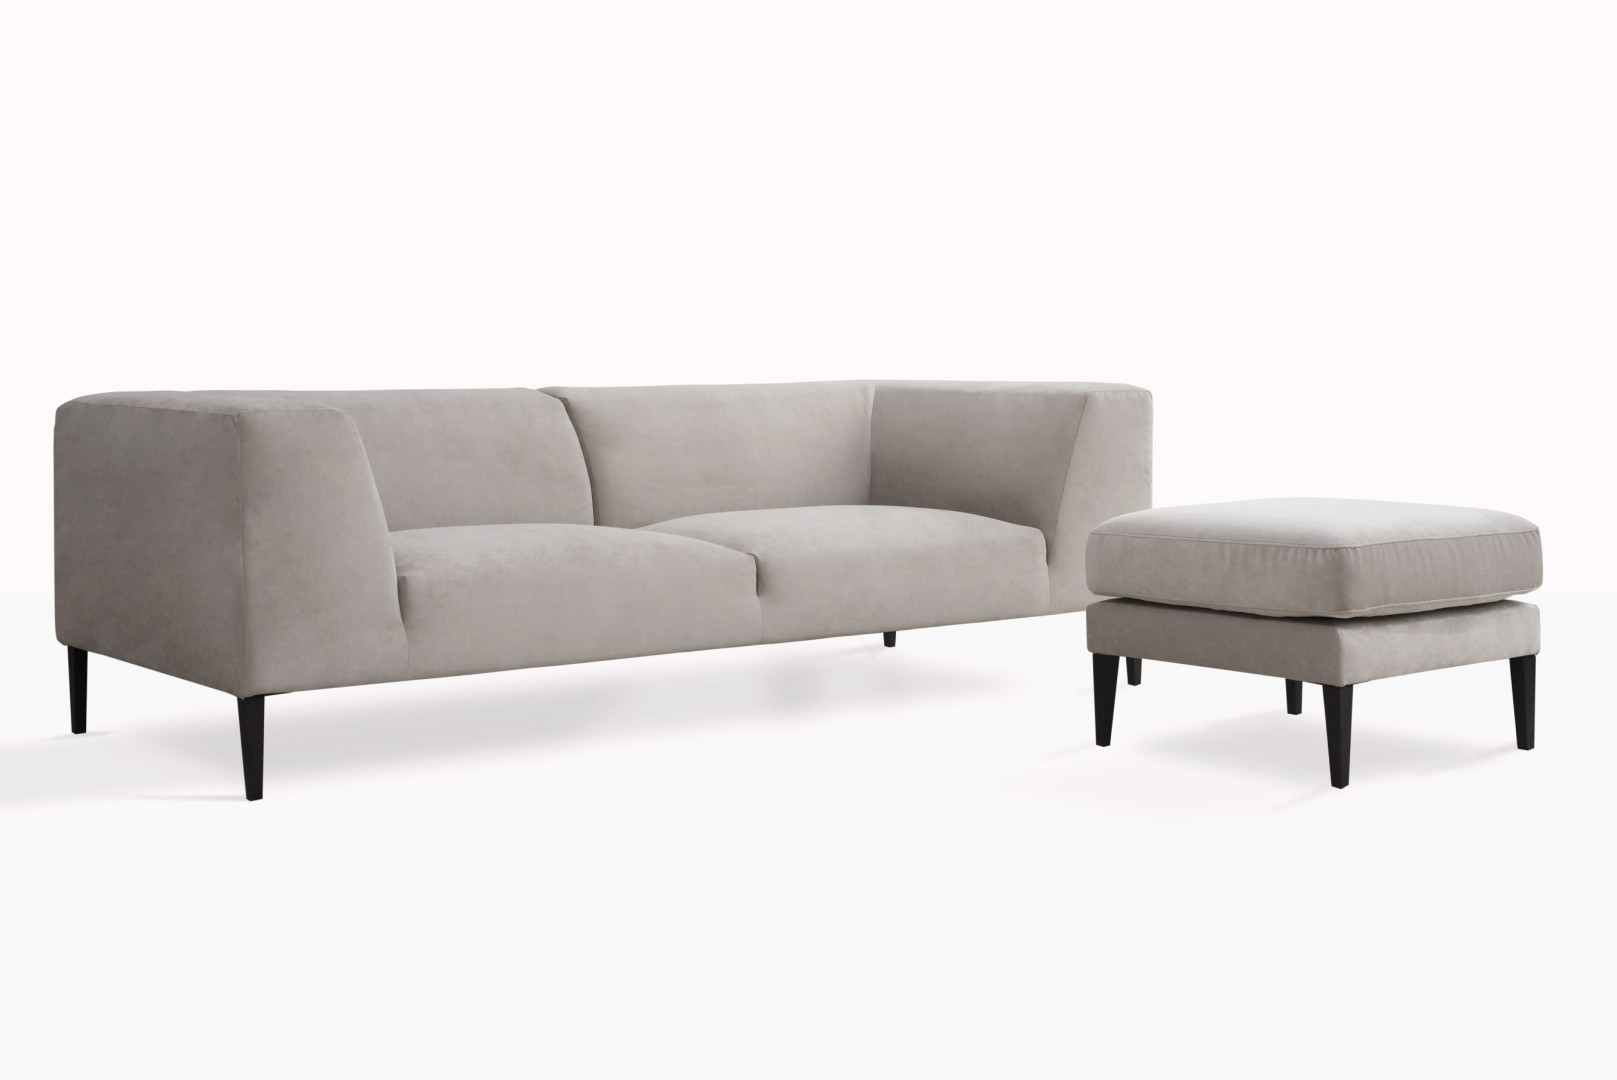 Sofa Mia marki Rosanero